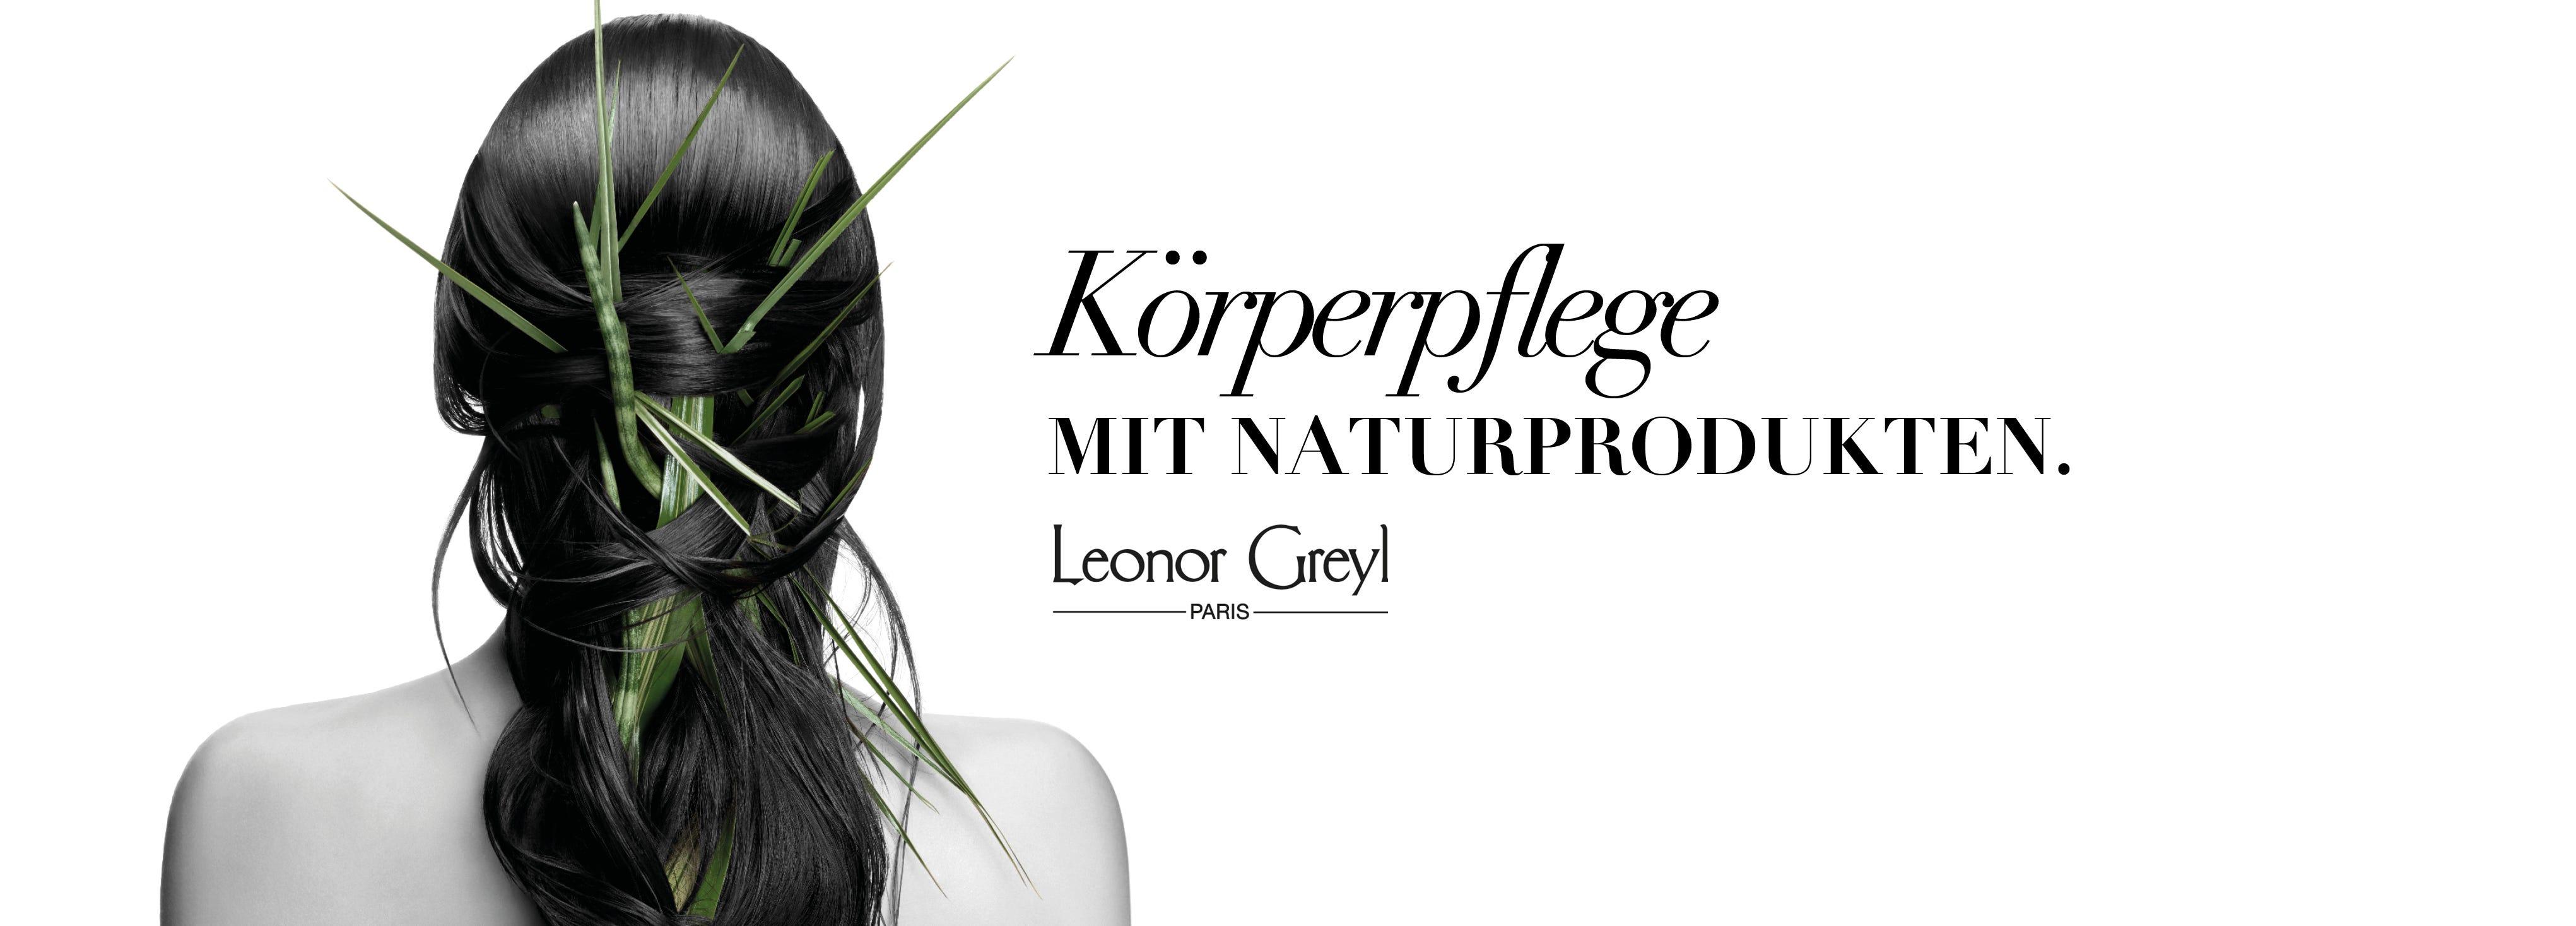 Leonor Greyl Körperpflege